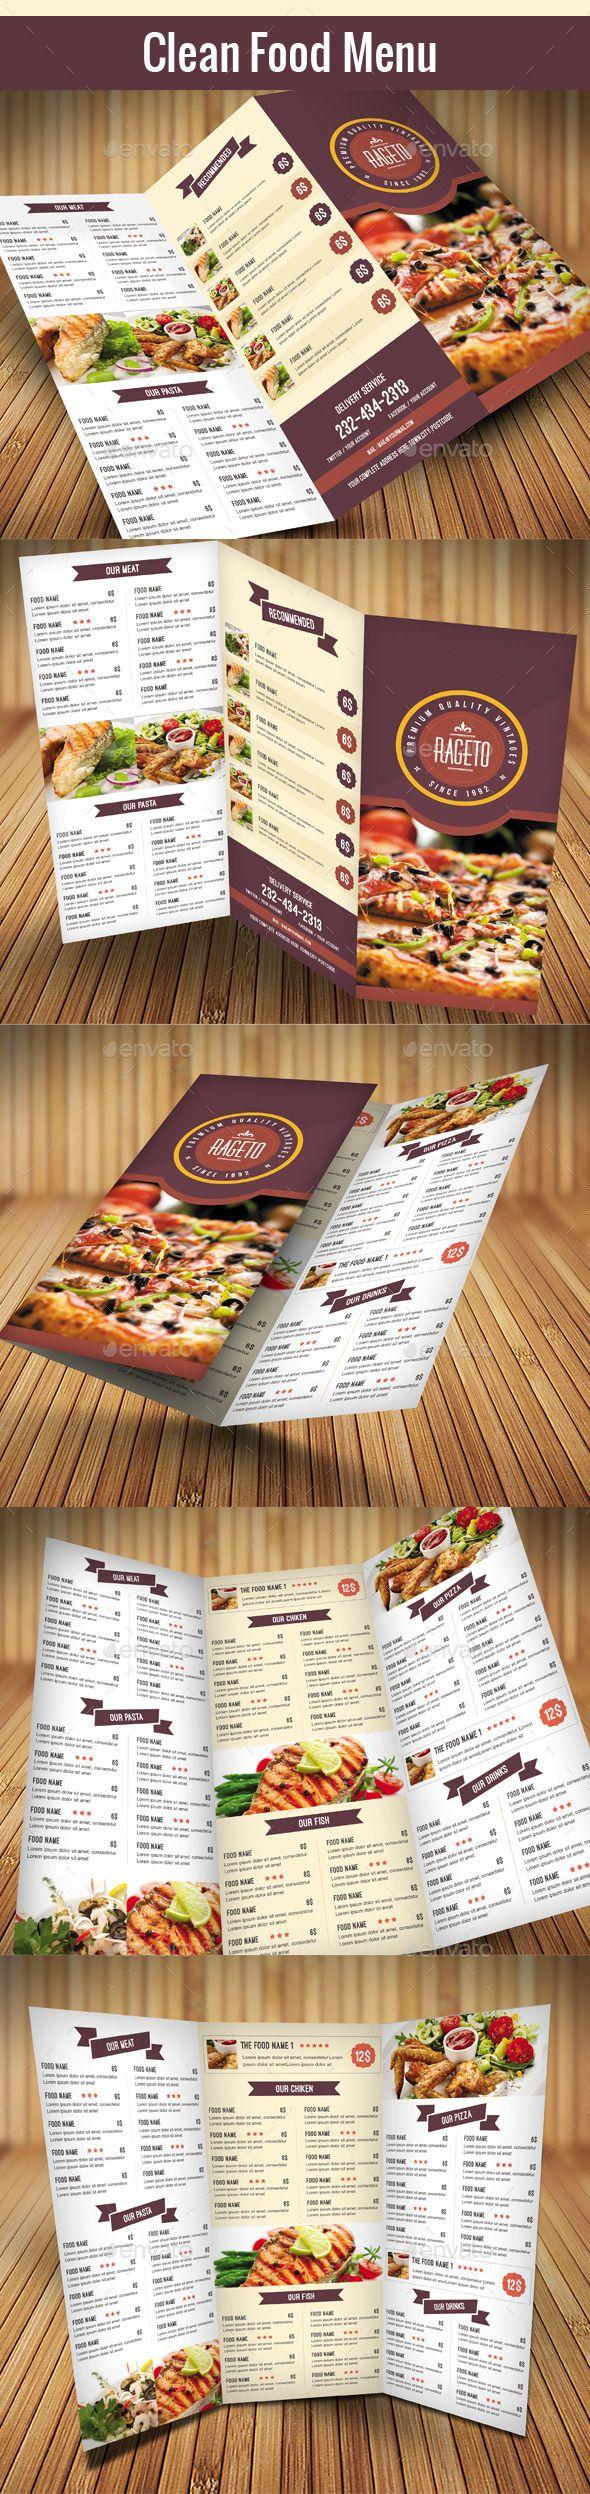 Clean Food Menu Template #design Download: http://graphicriver.net/item/clean-food-menu-2/12757118?ref=ksioks